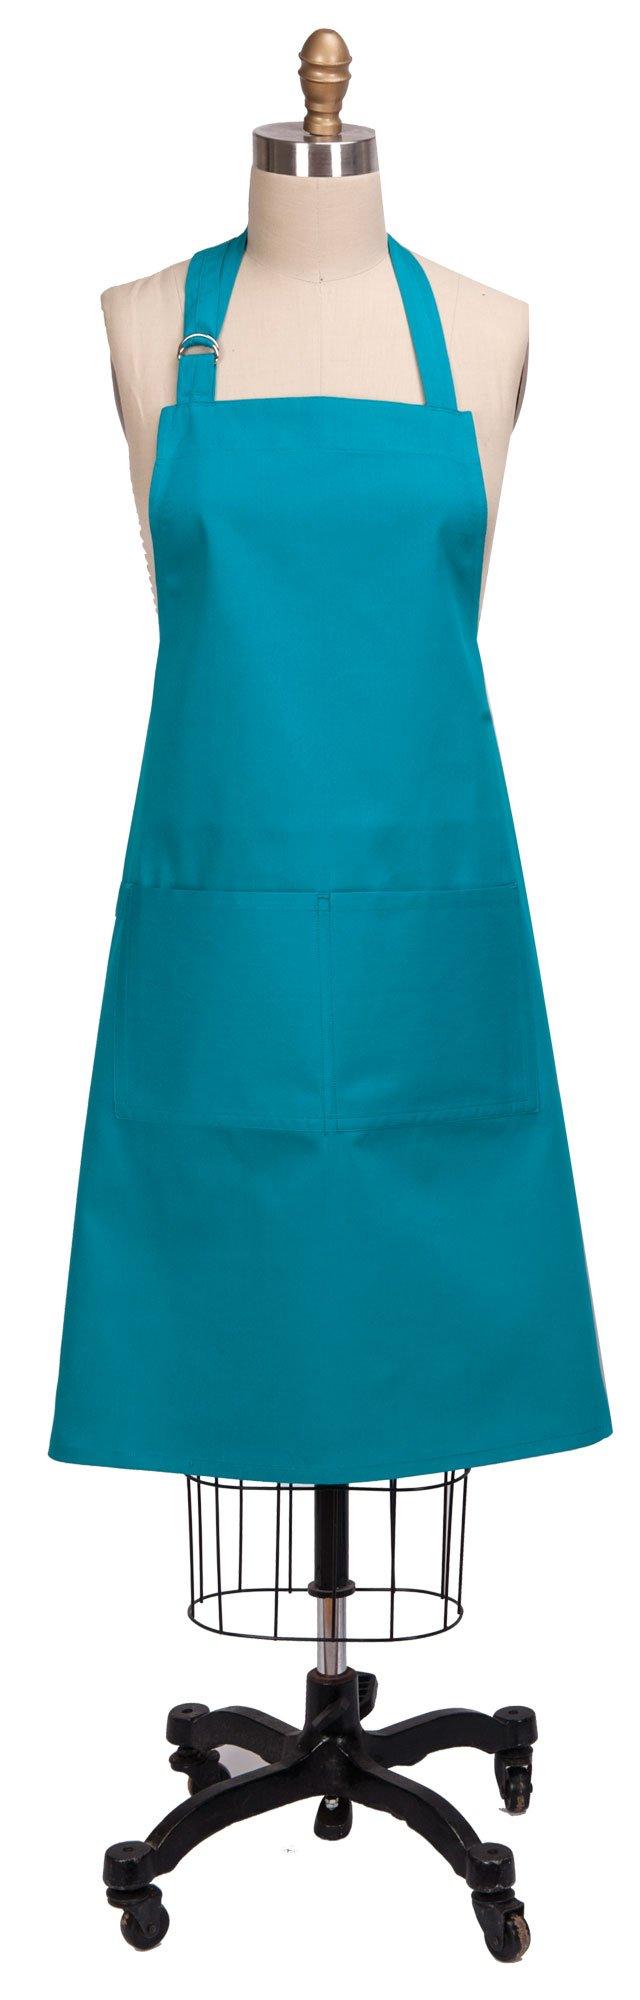 Kay Dee Designs R9261 Everyday Basics Chef Apron, Enamel